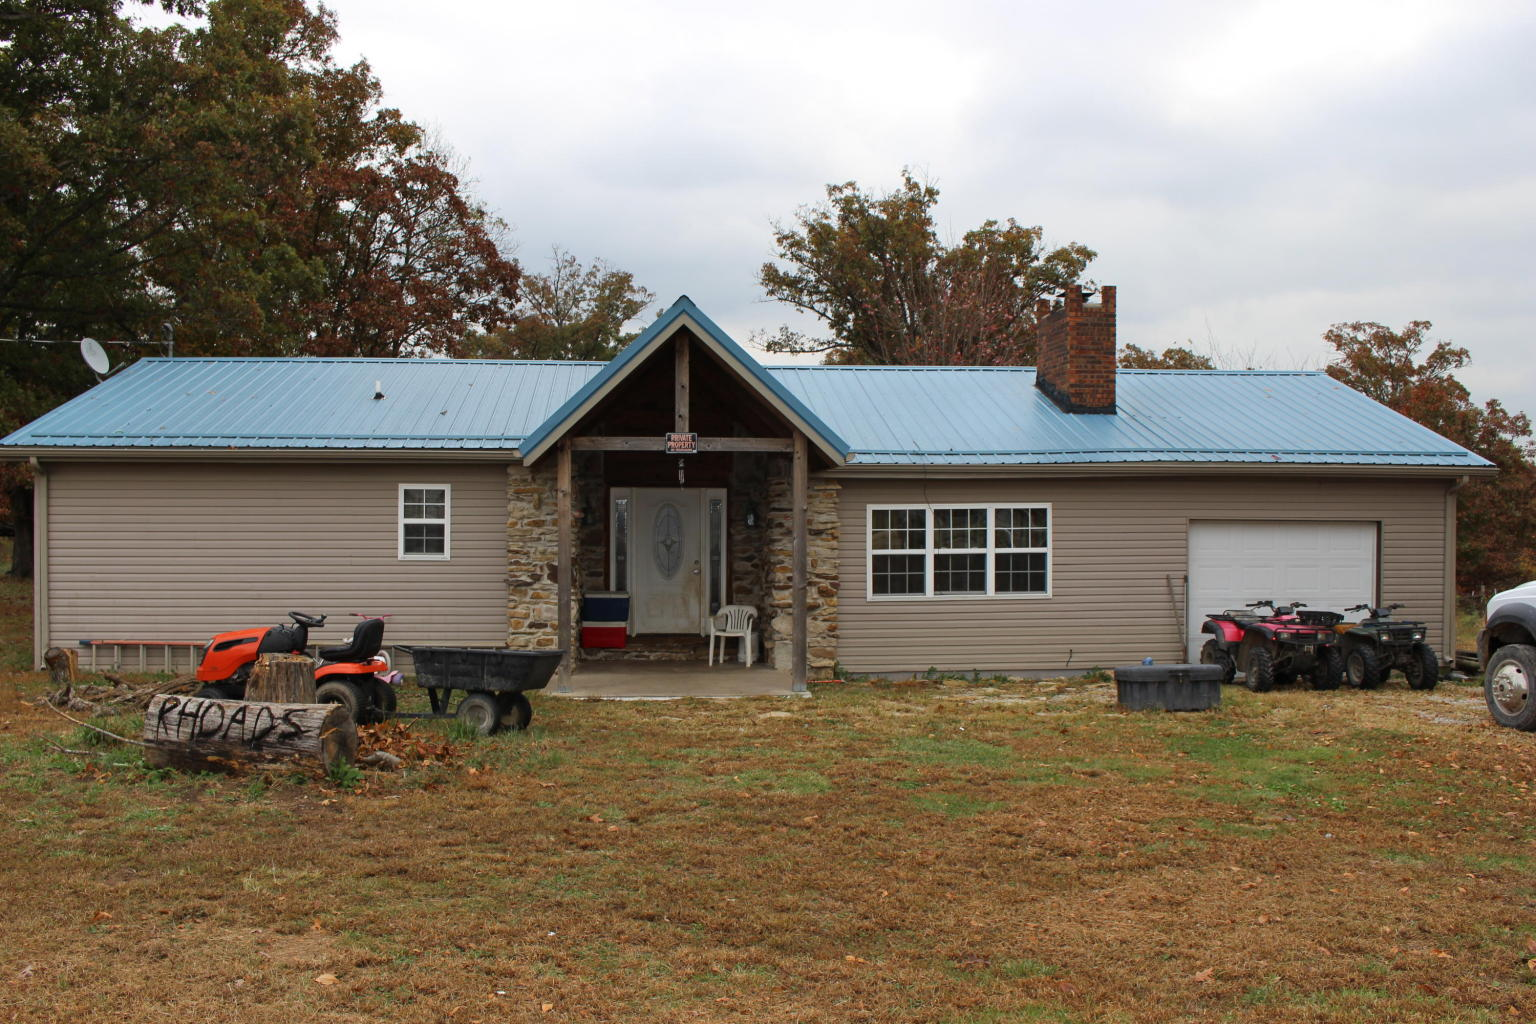 14 petunia drive, Louisburg, Missouri 65685